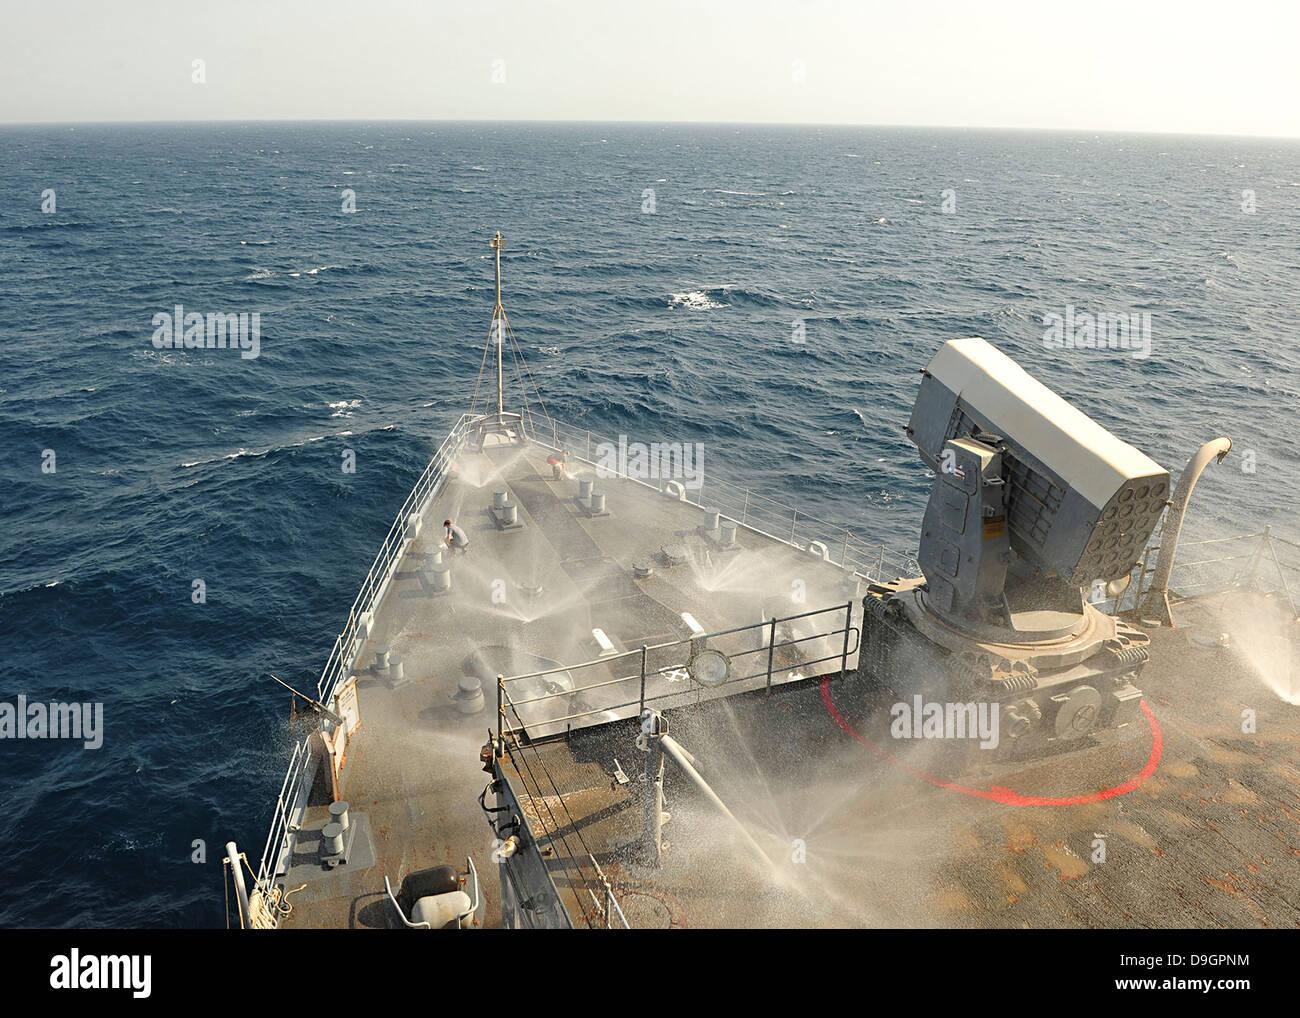 The countermeasure wash down sprinkler system aboard USS Gunston Hall. - Stock Image